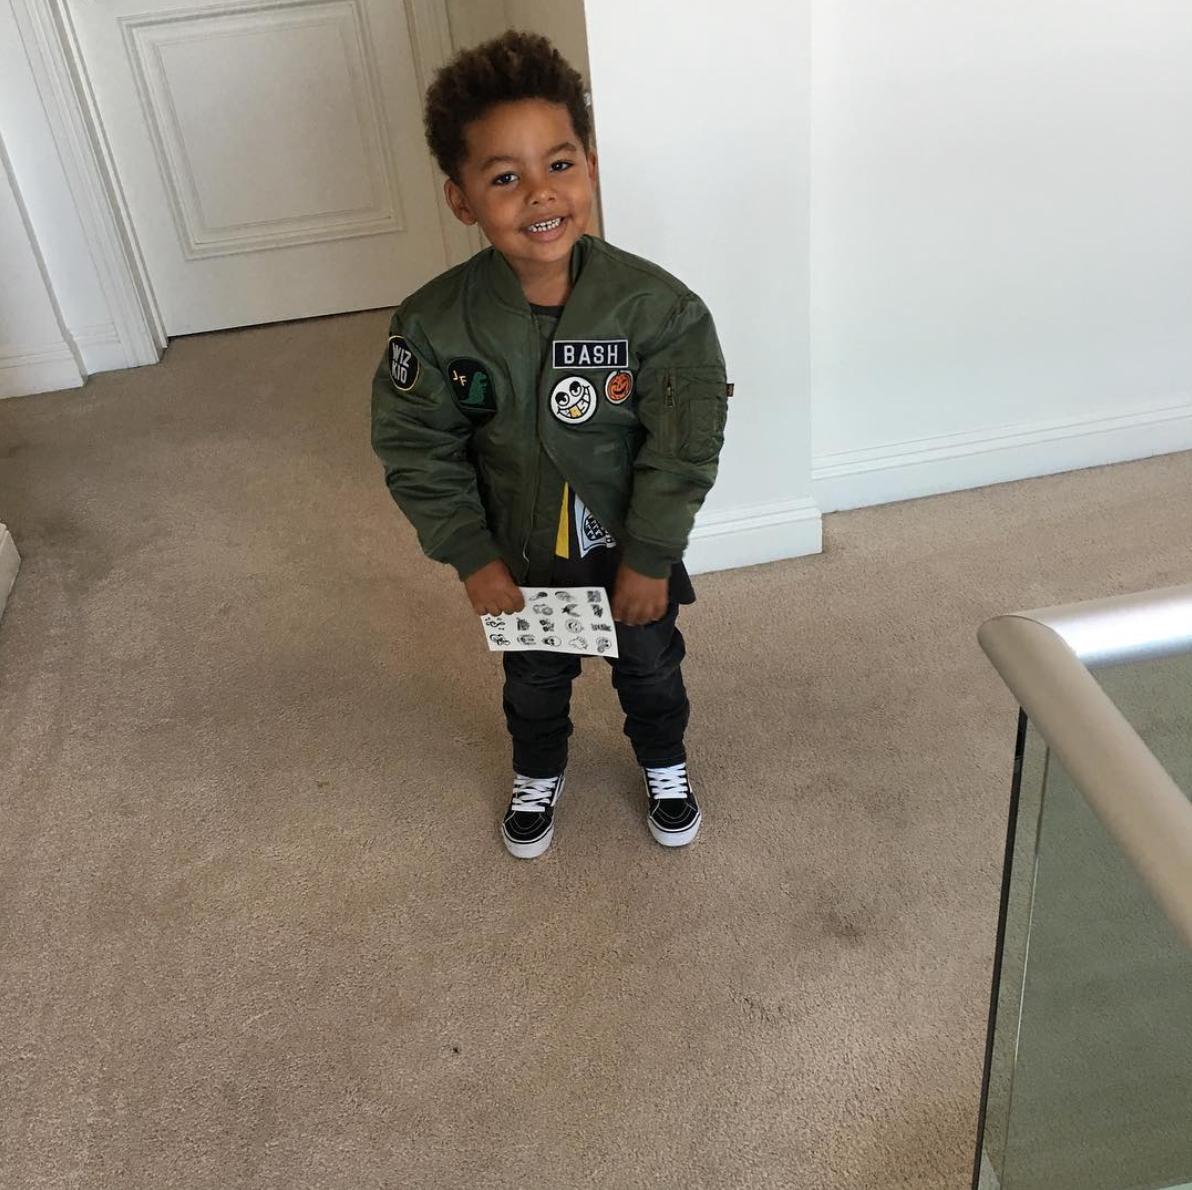 Wiz Khalifa's son, Sebastian Taylor Thomaz rocks his